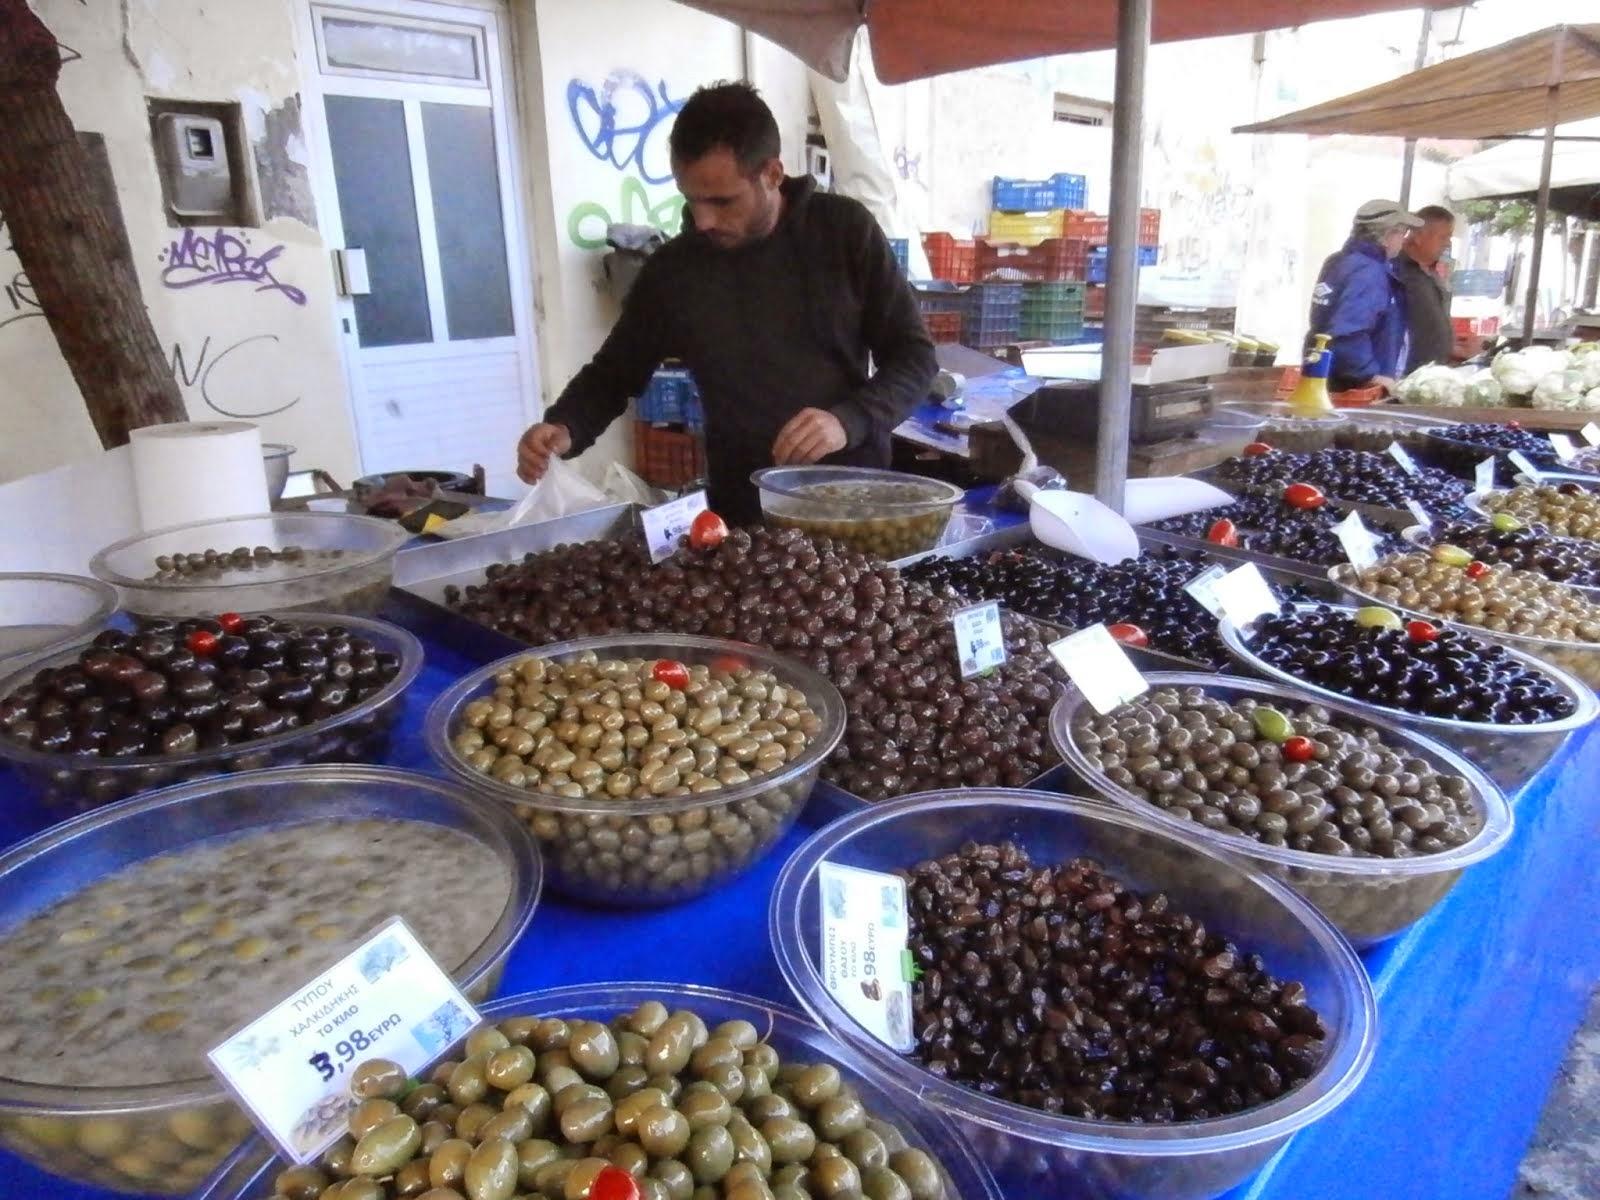 Olive Stand, Farmers' Market, Chania, November 2014